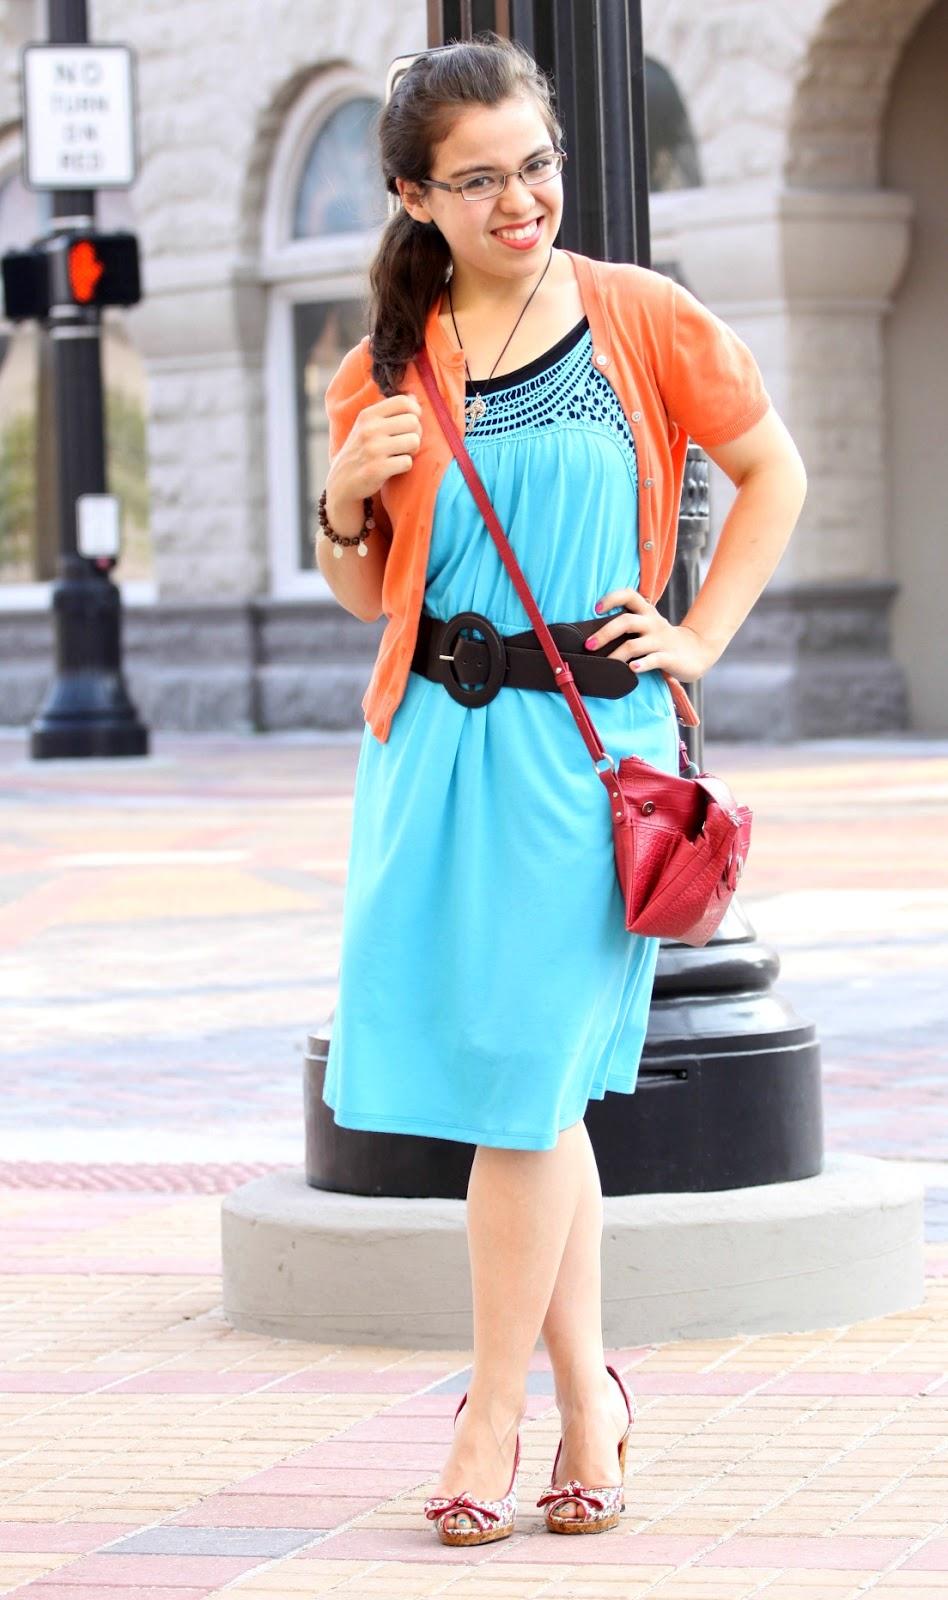 Cute Modest Summer Dresses | www.pixshark.com - Images Galleries With A Bite!